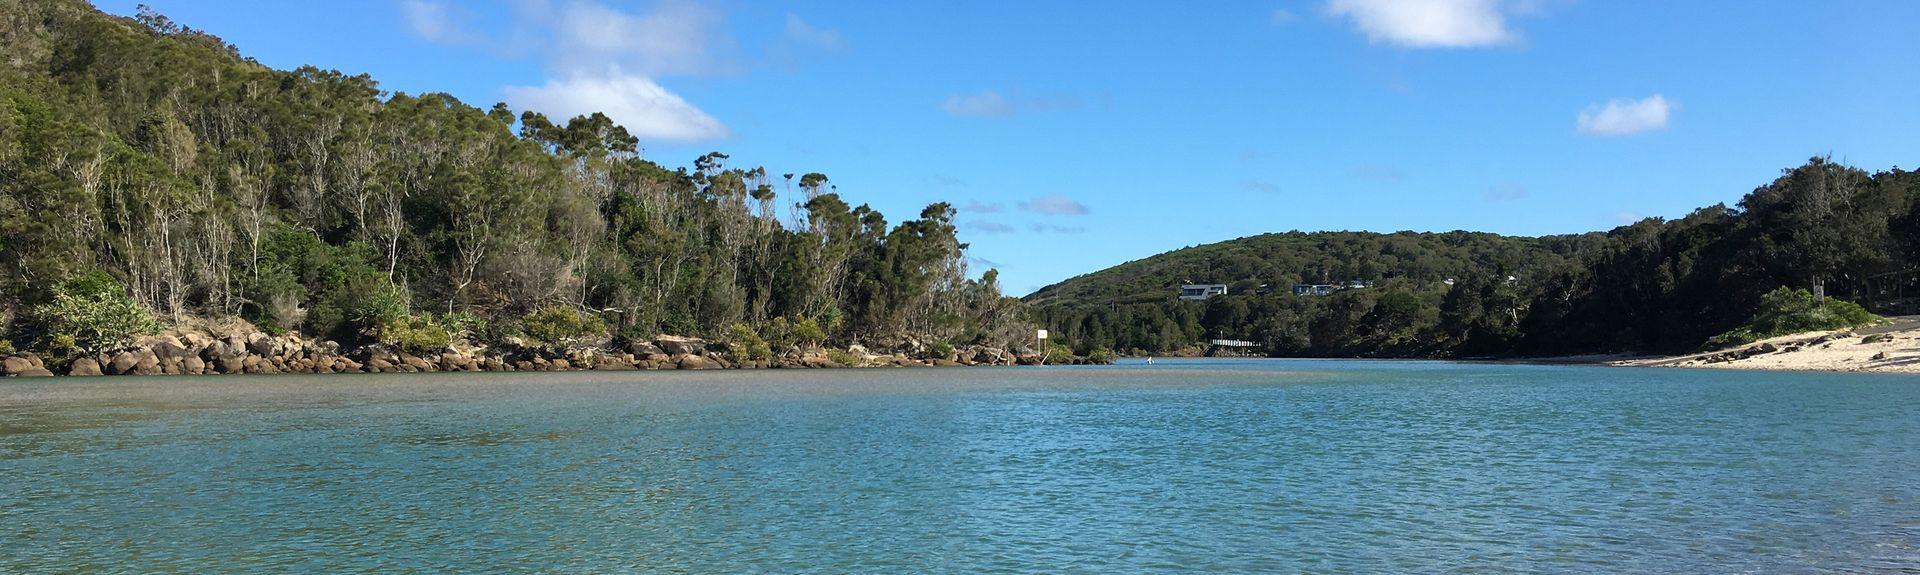 Brighton Park, South West Rocks, New South Wales, Australia